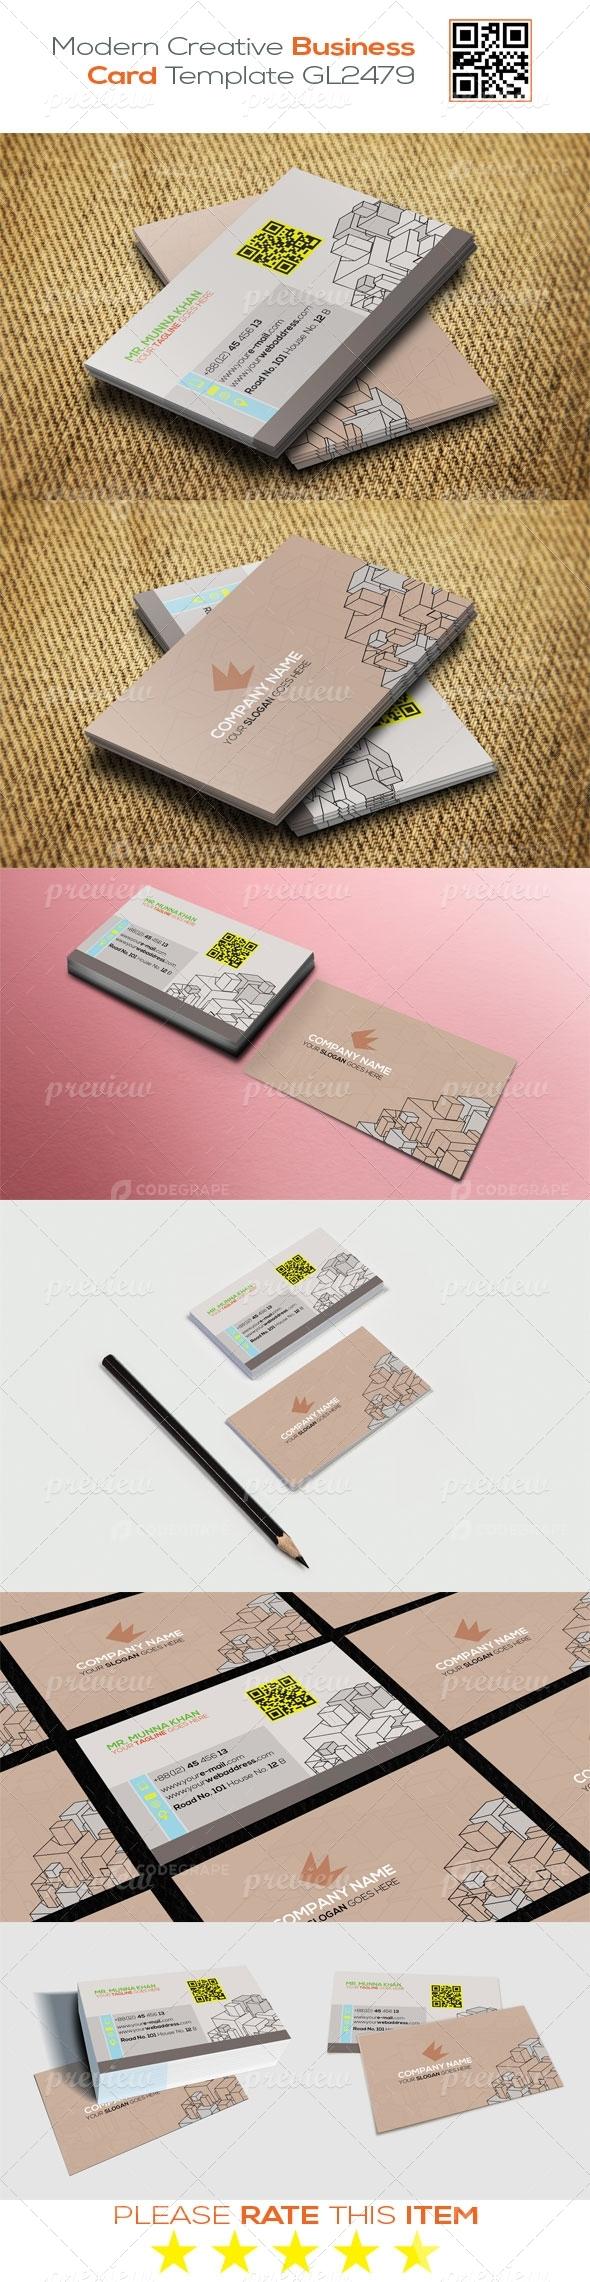 Modern Creative Business Card Template GL2479